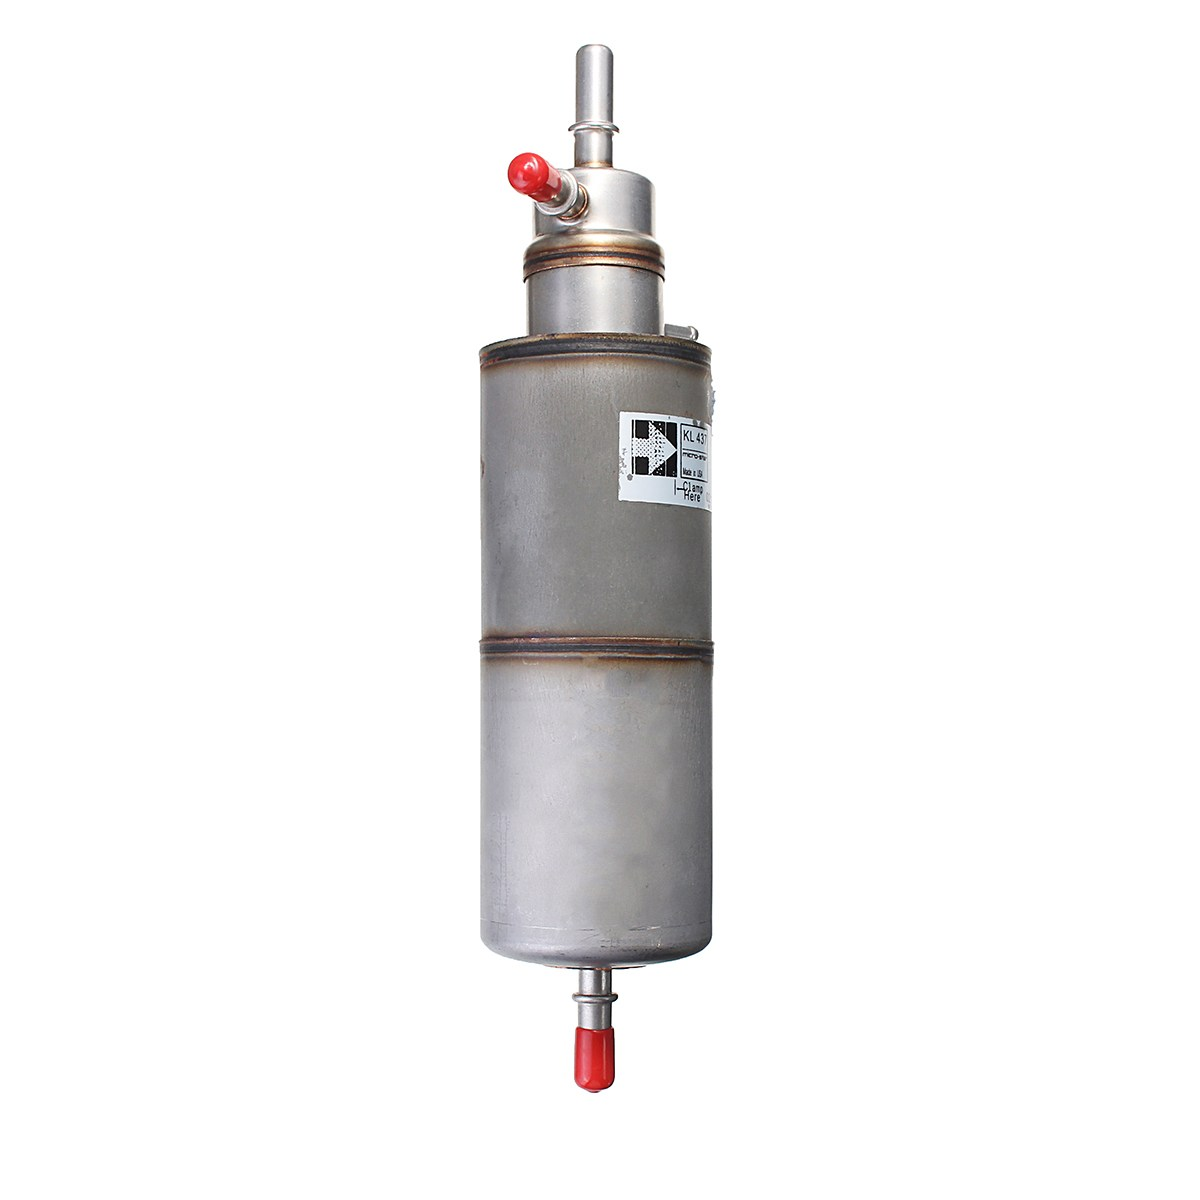 medium resolution of car oil fuel filter pressure regulator for mercedes benz ml55 for amg ml320 ml430 1634770701